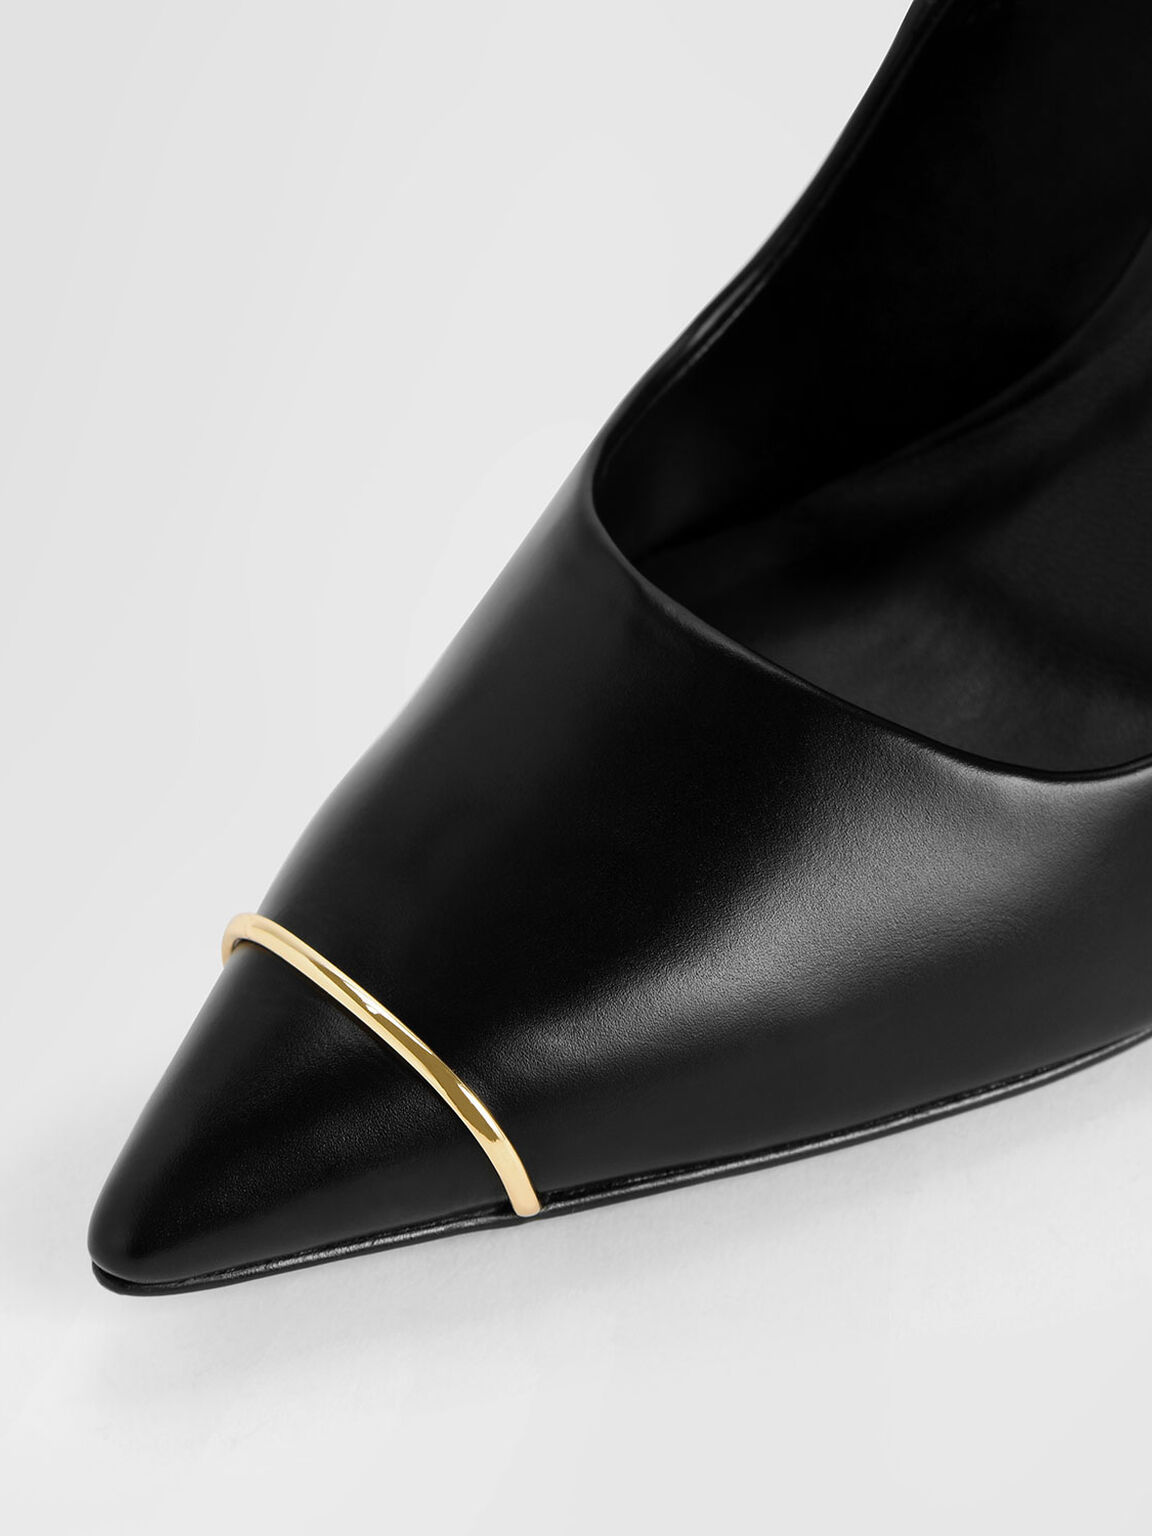 Metallic Accent Pointed Toe Stiletto Pumps, Black, hi-res